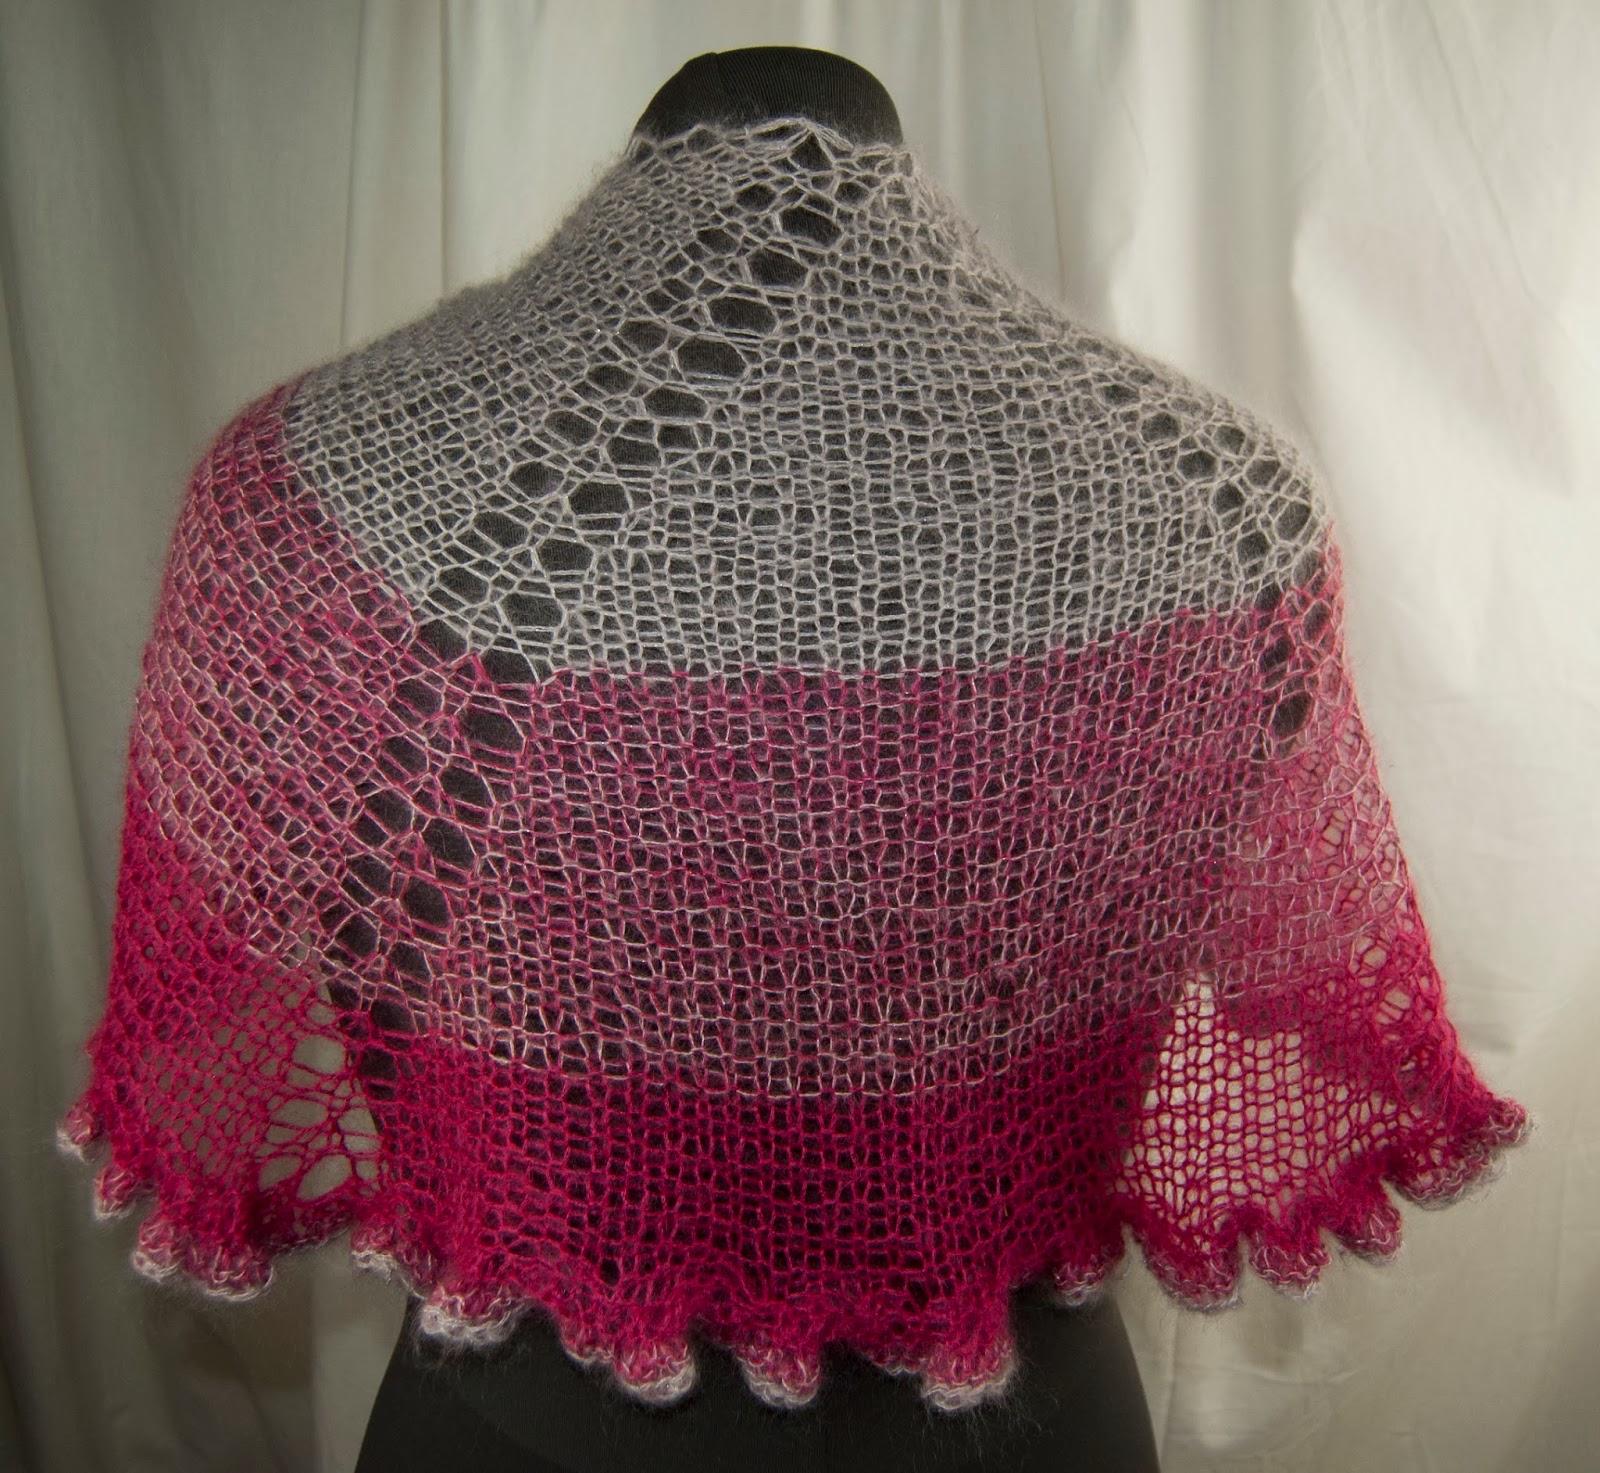 Abbreviation Kfb In Knitting : Cascade yarns gradient sparkle shawl knit in kid